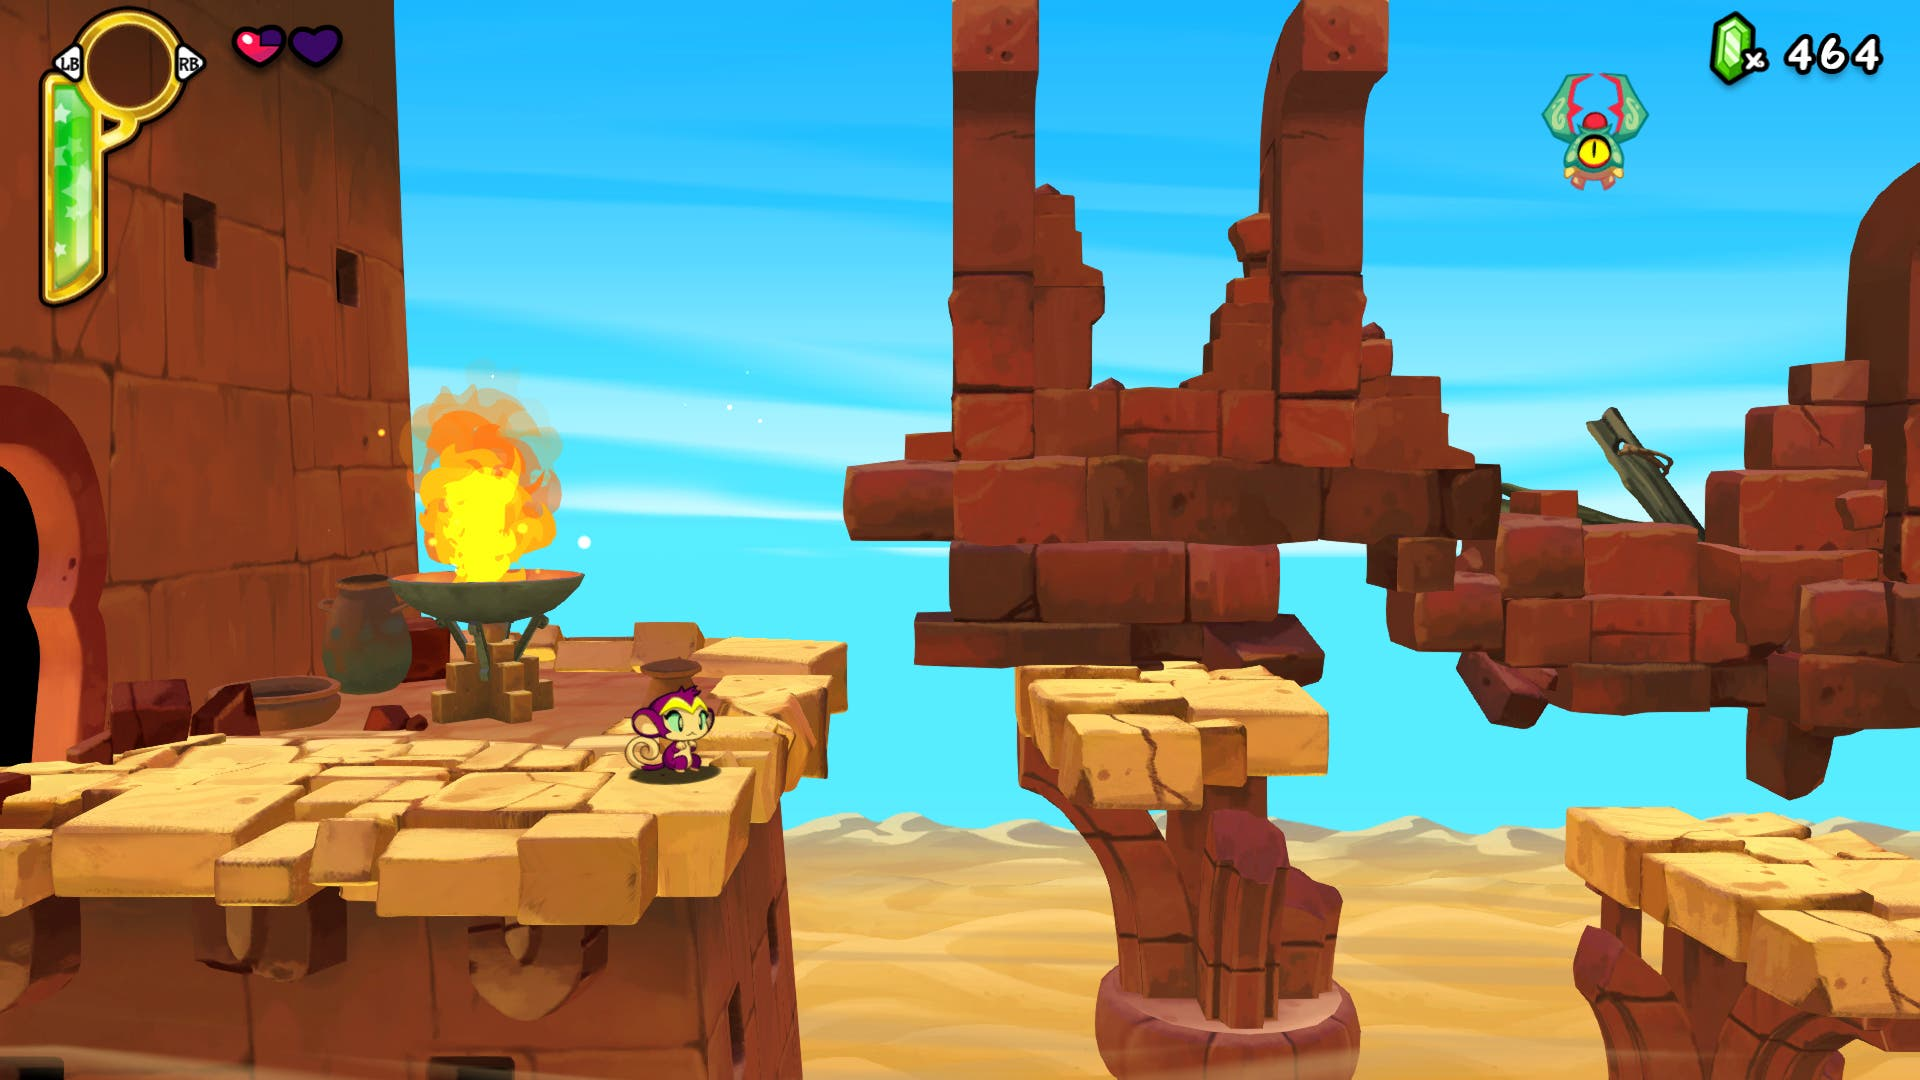 Análisis de Shantae Half-Genie Hero 2